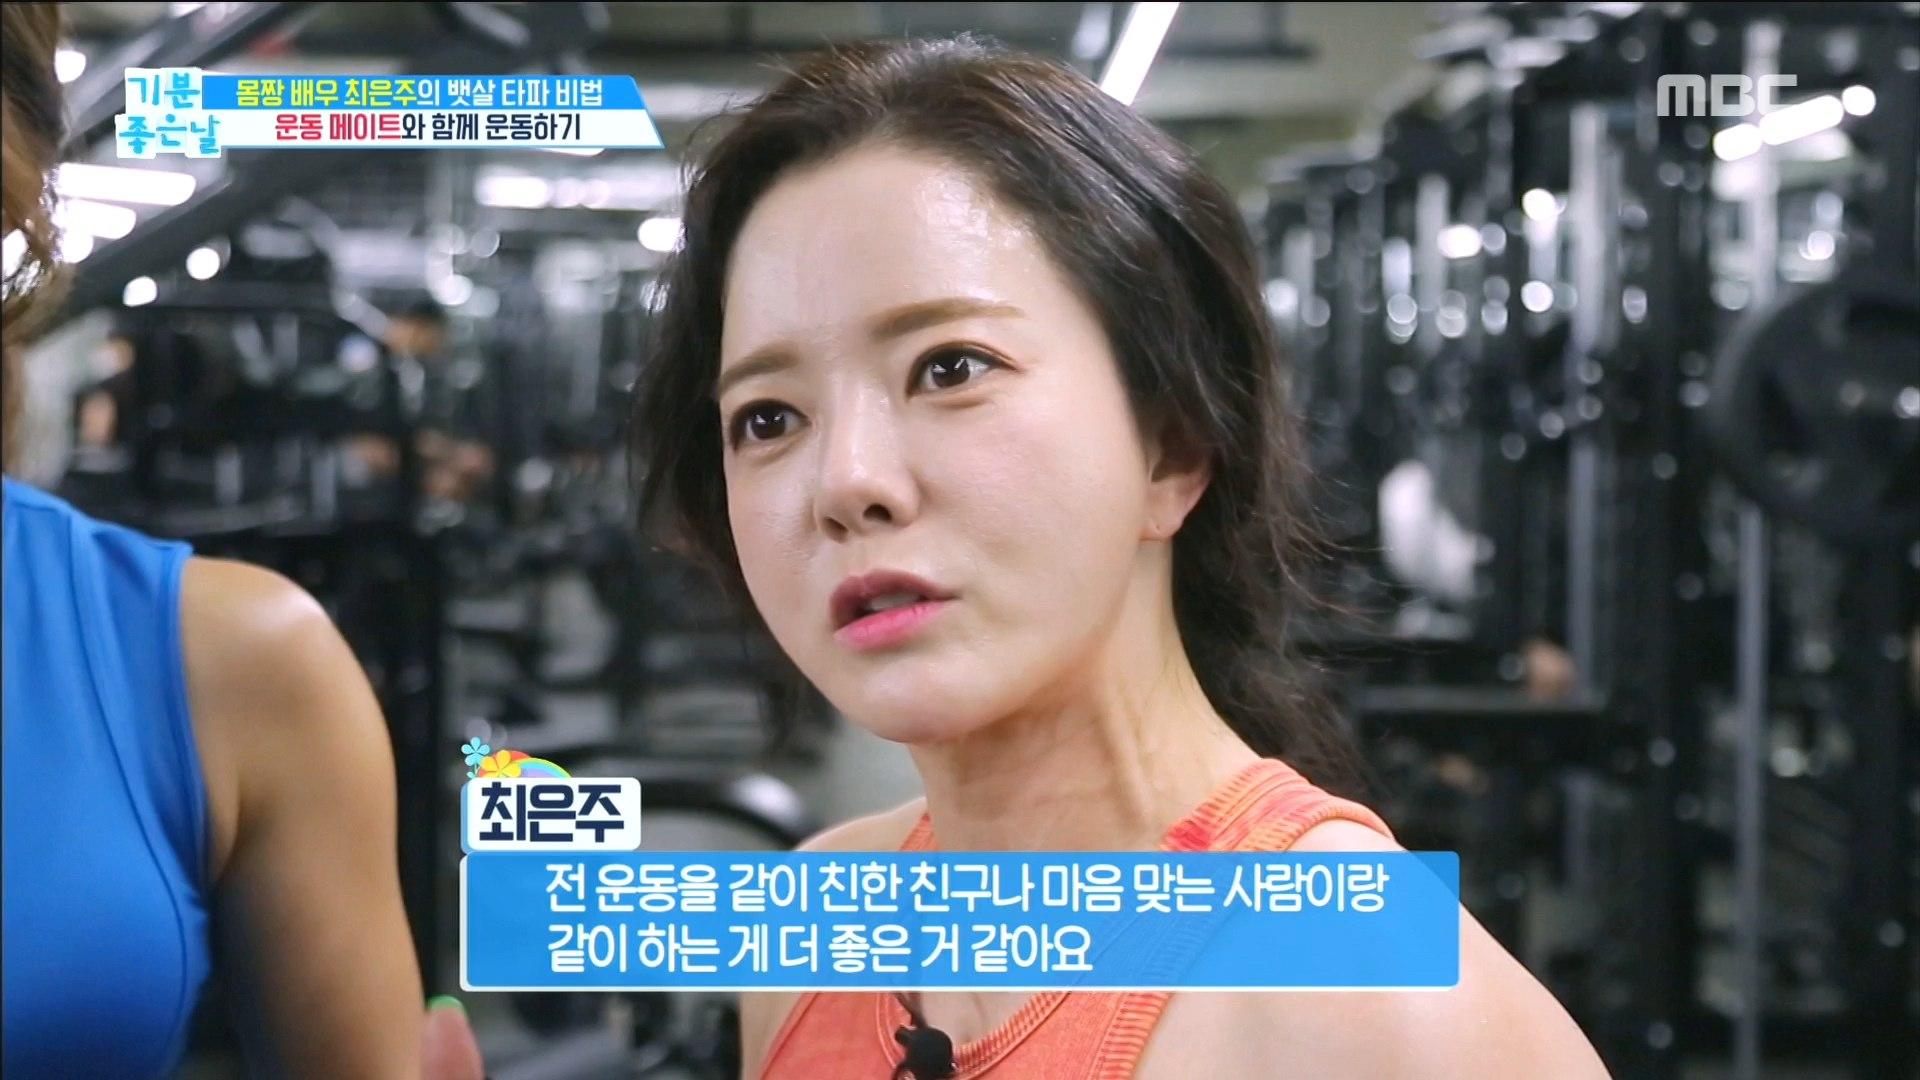 [HEALTH] Choi Eun-joo's daily exercise routine,기분 좋은 날20190702